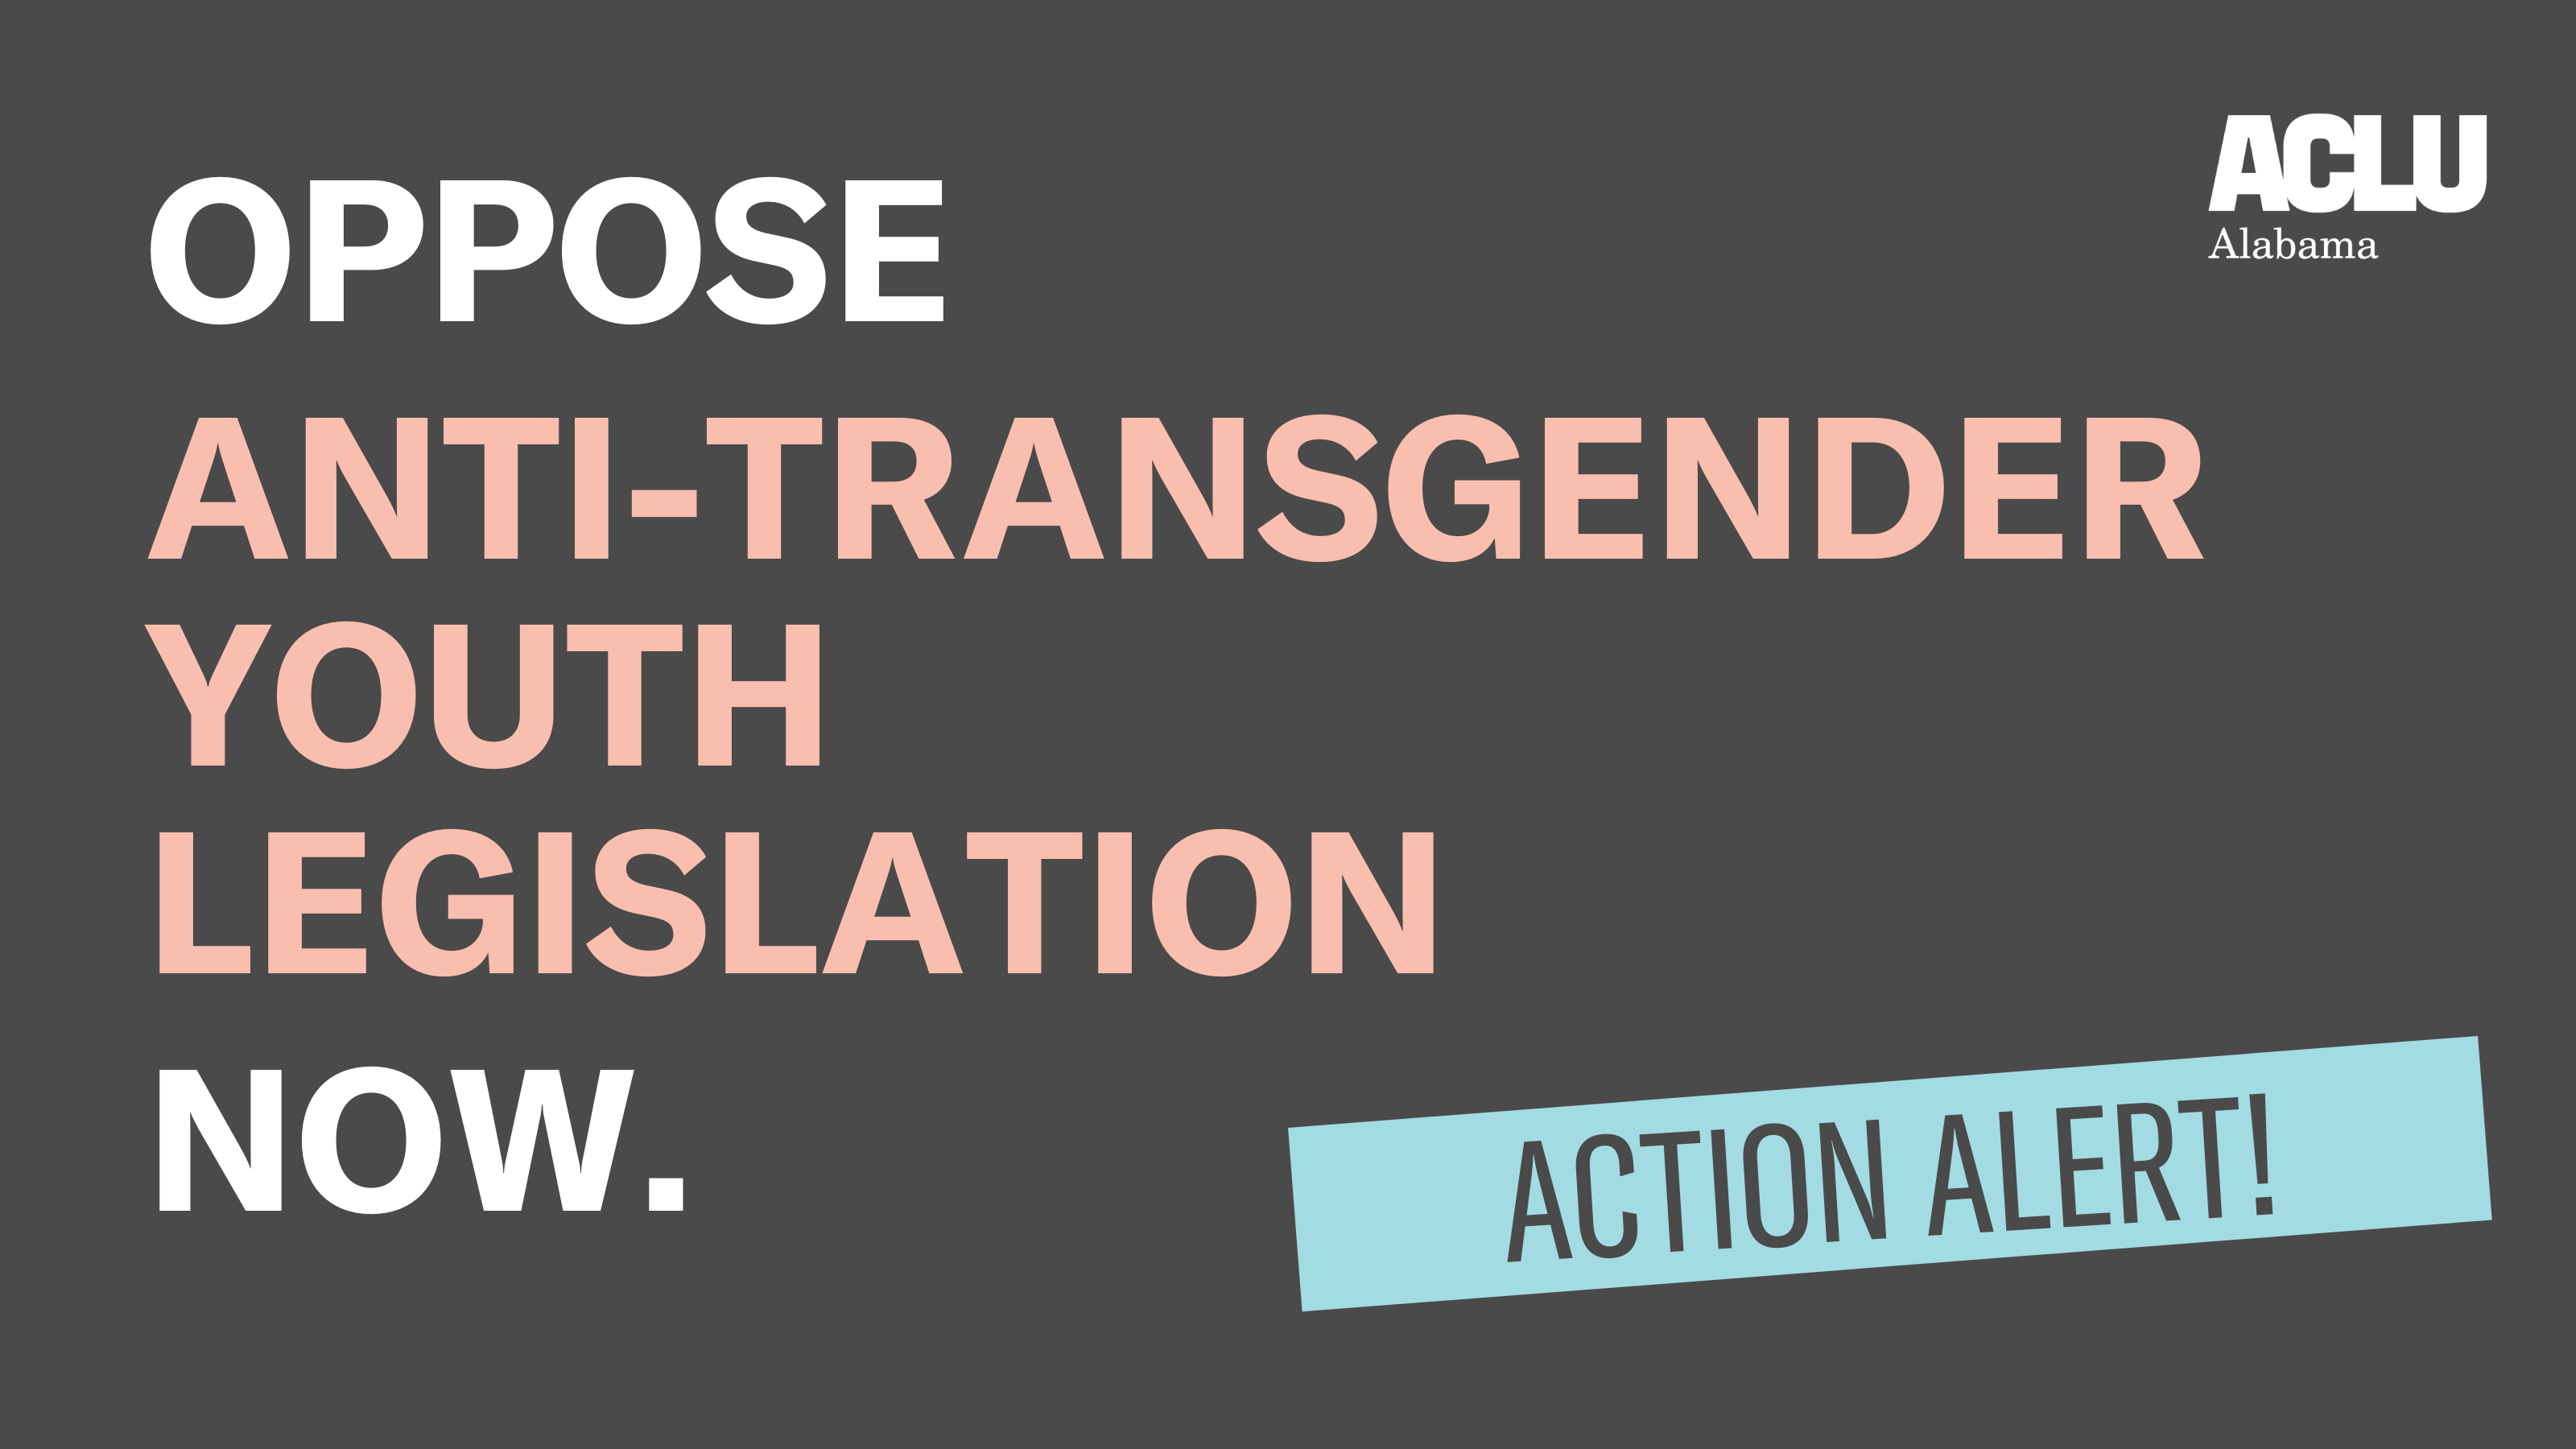 Oppose Anti-Transgender Youth Legislation Now.